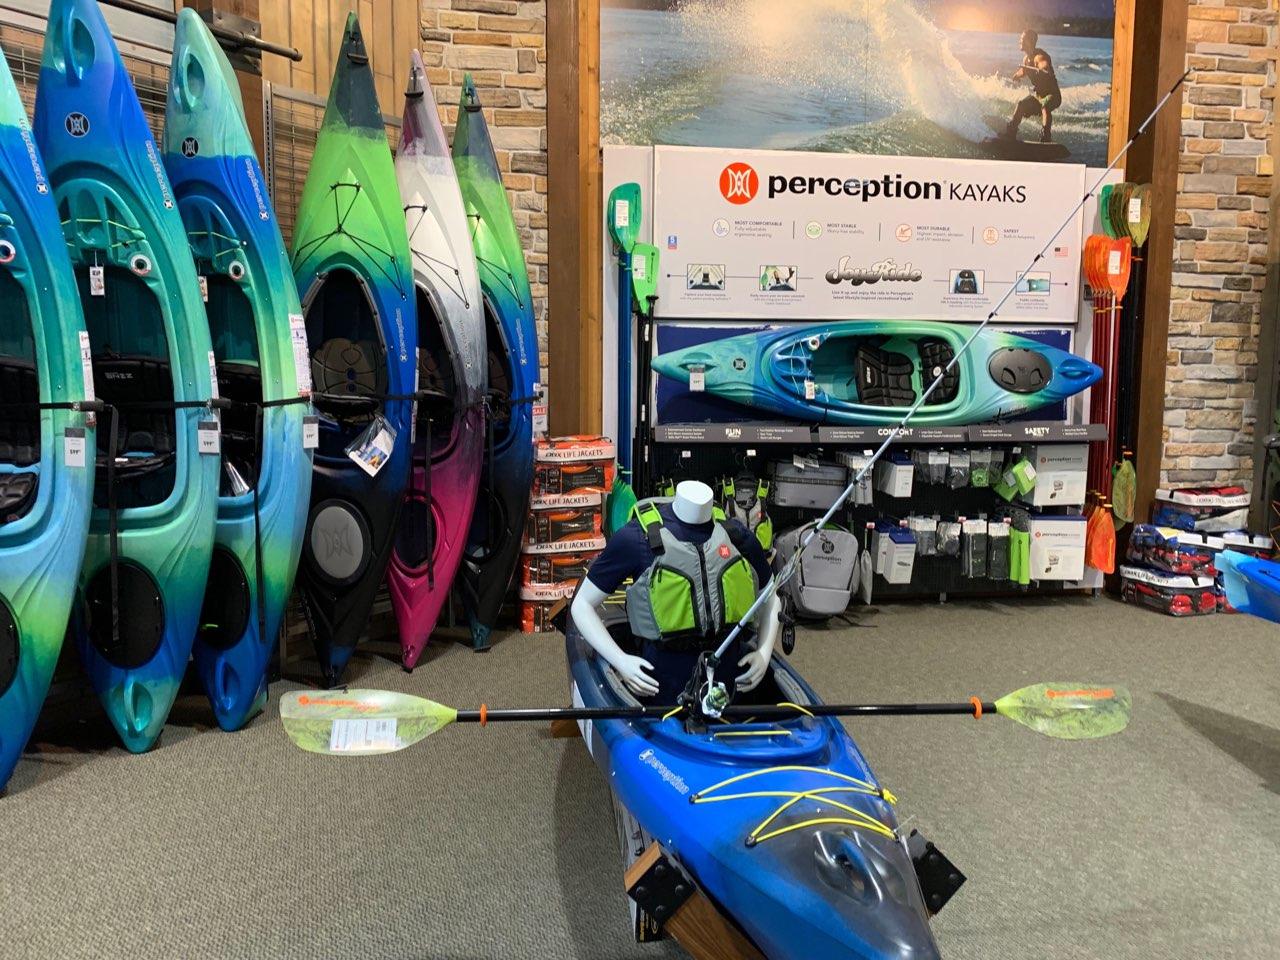 Perception Kayaks Retail Merchandising Display — AXIS